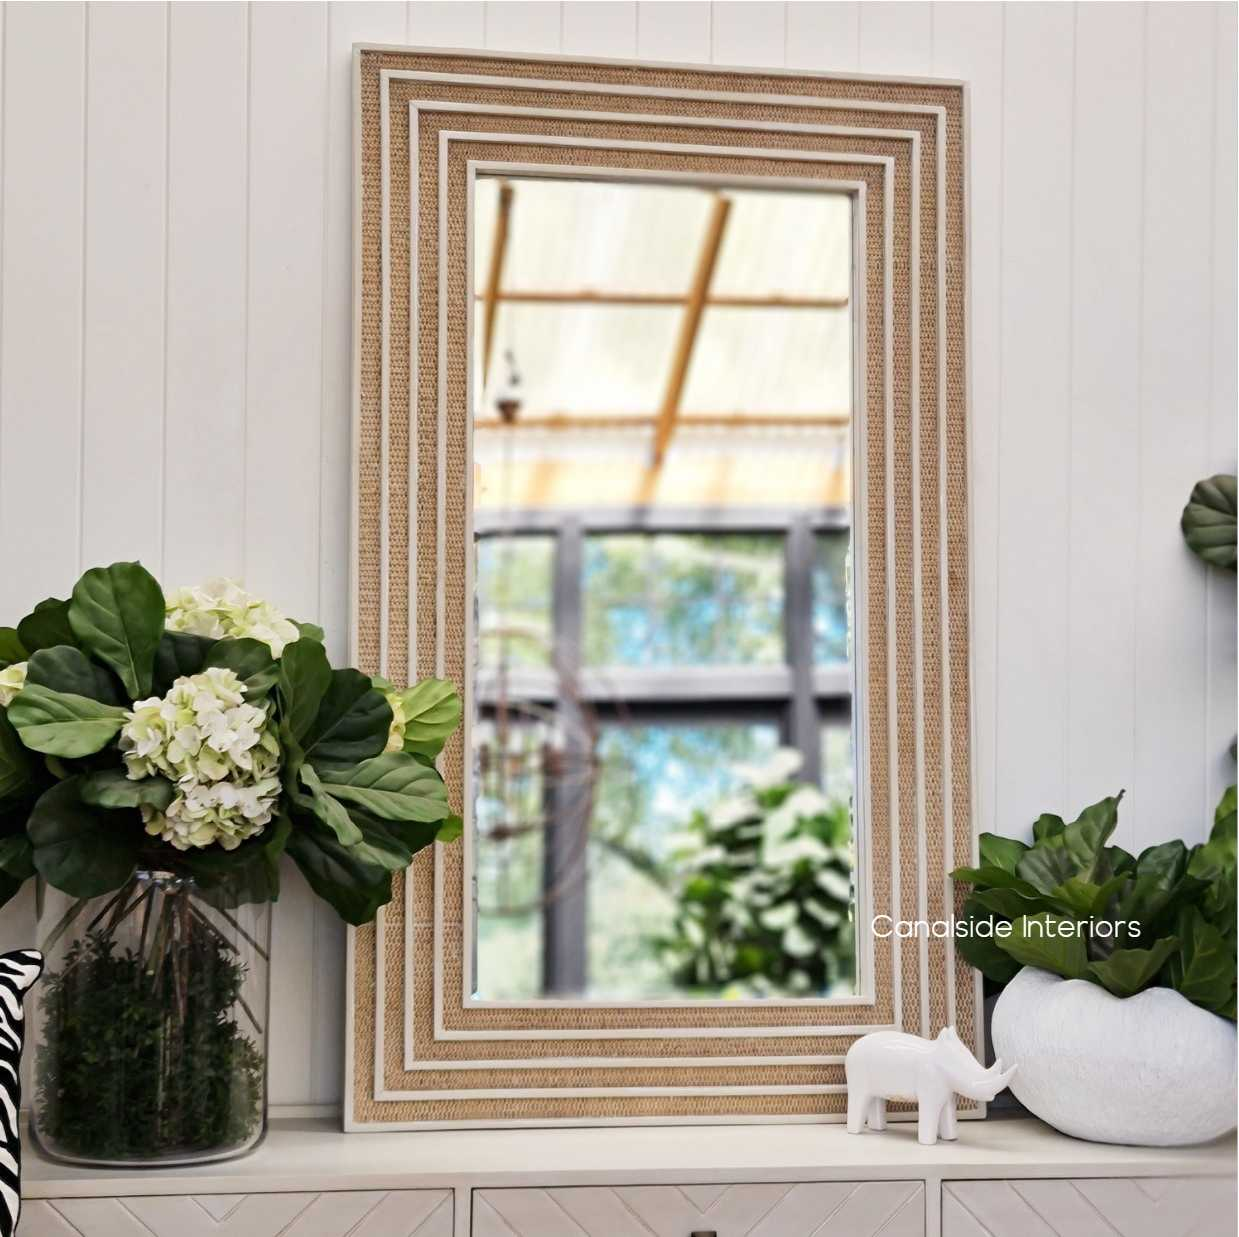 Brielle Rattan Rectangular Mirror HAMPTONS Style, PLANTATION Style, MIRRORS, PLANTATION STYLE cane chinoiserie island